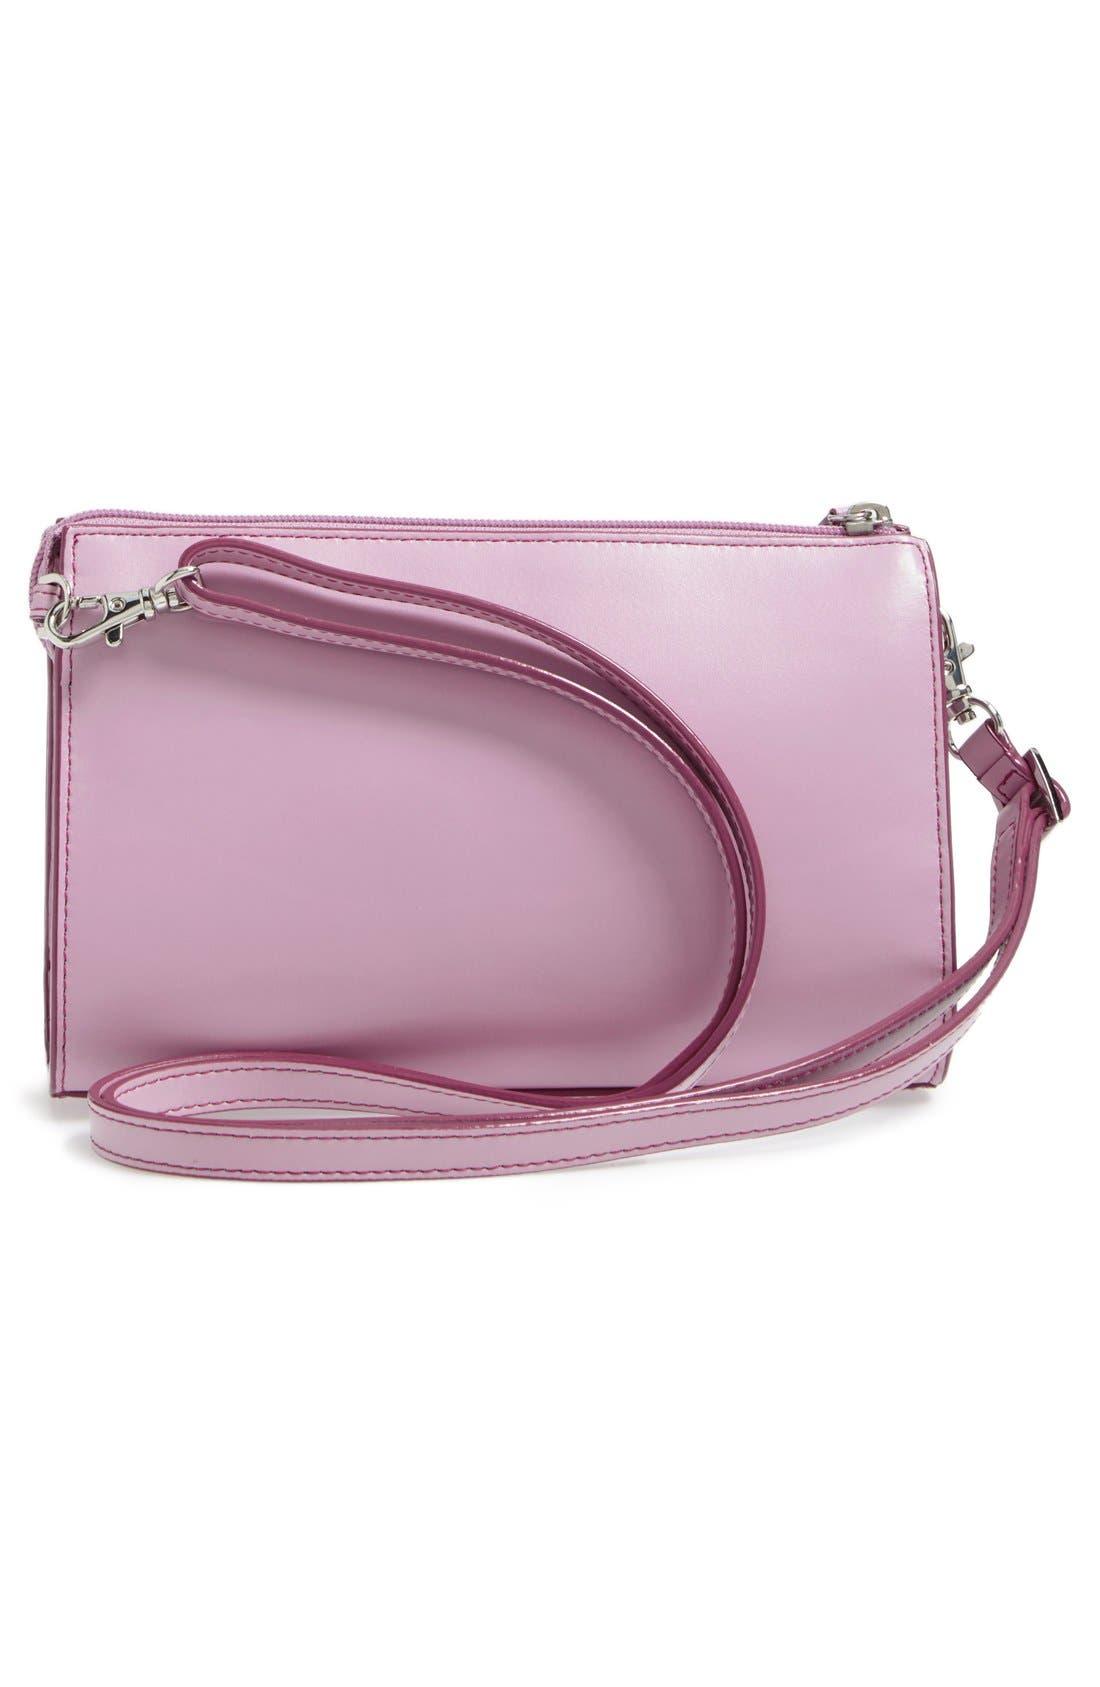 Lodis'Audrey Collection -Vicky' ConvertibleCrossbody Bag,                             Alternate thumbnail 20, color,